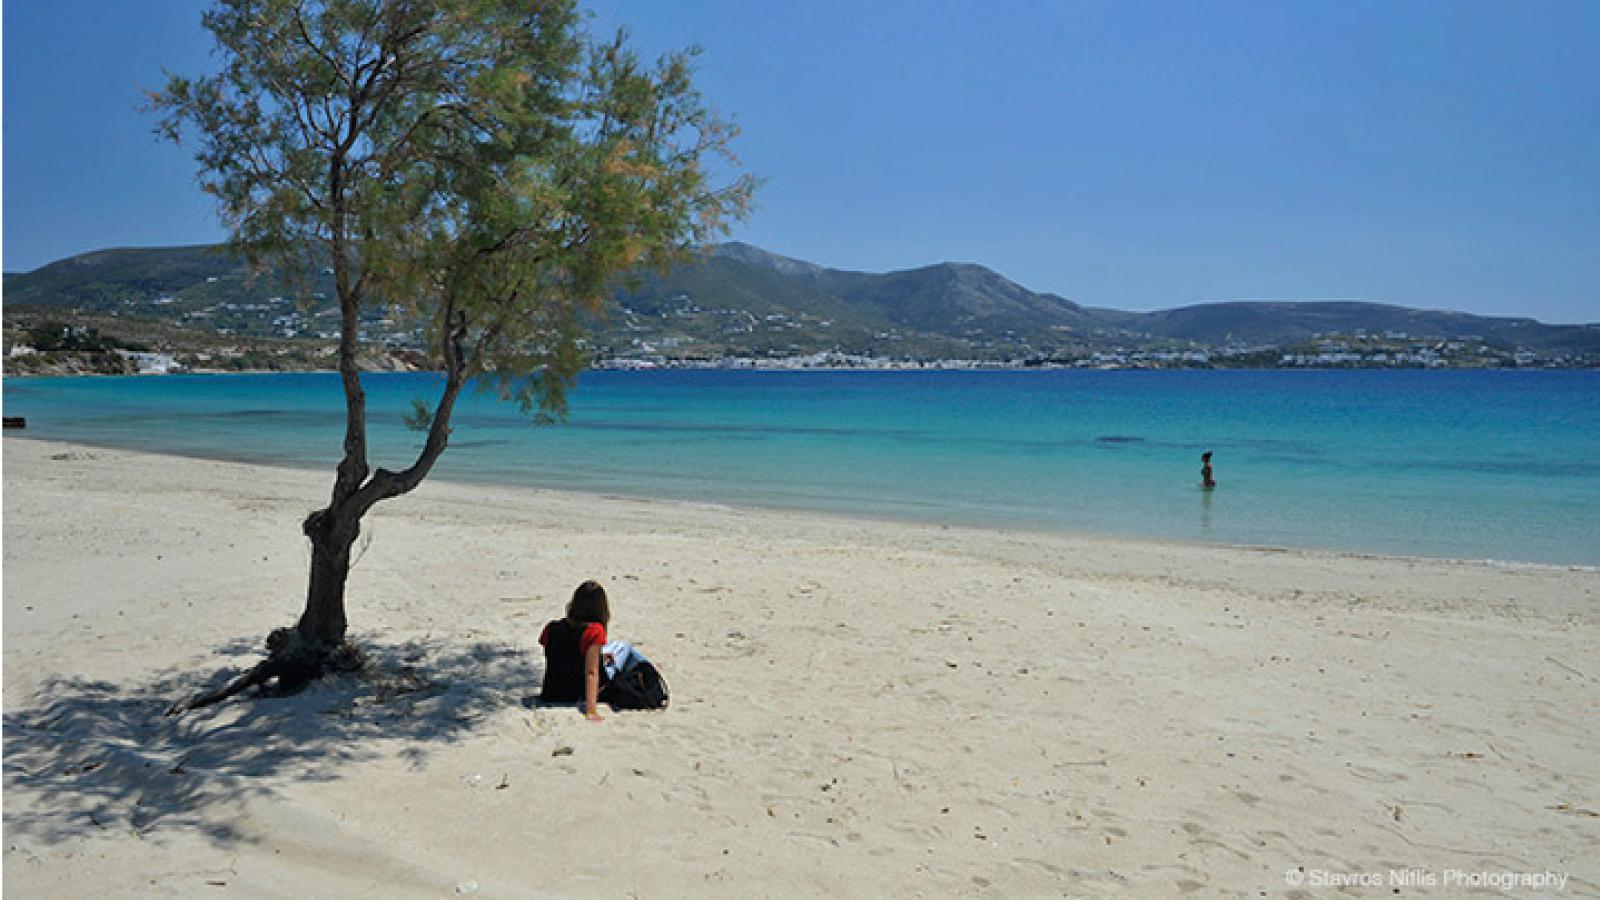 The Island of Kefalonia